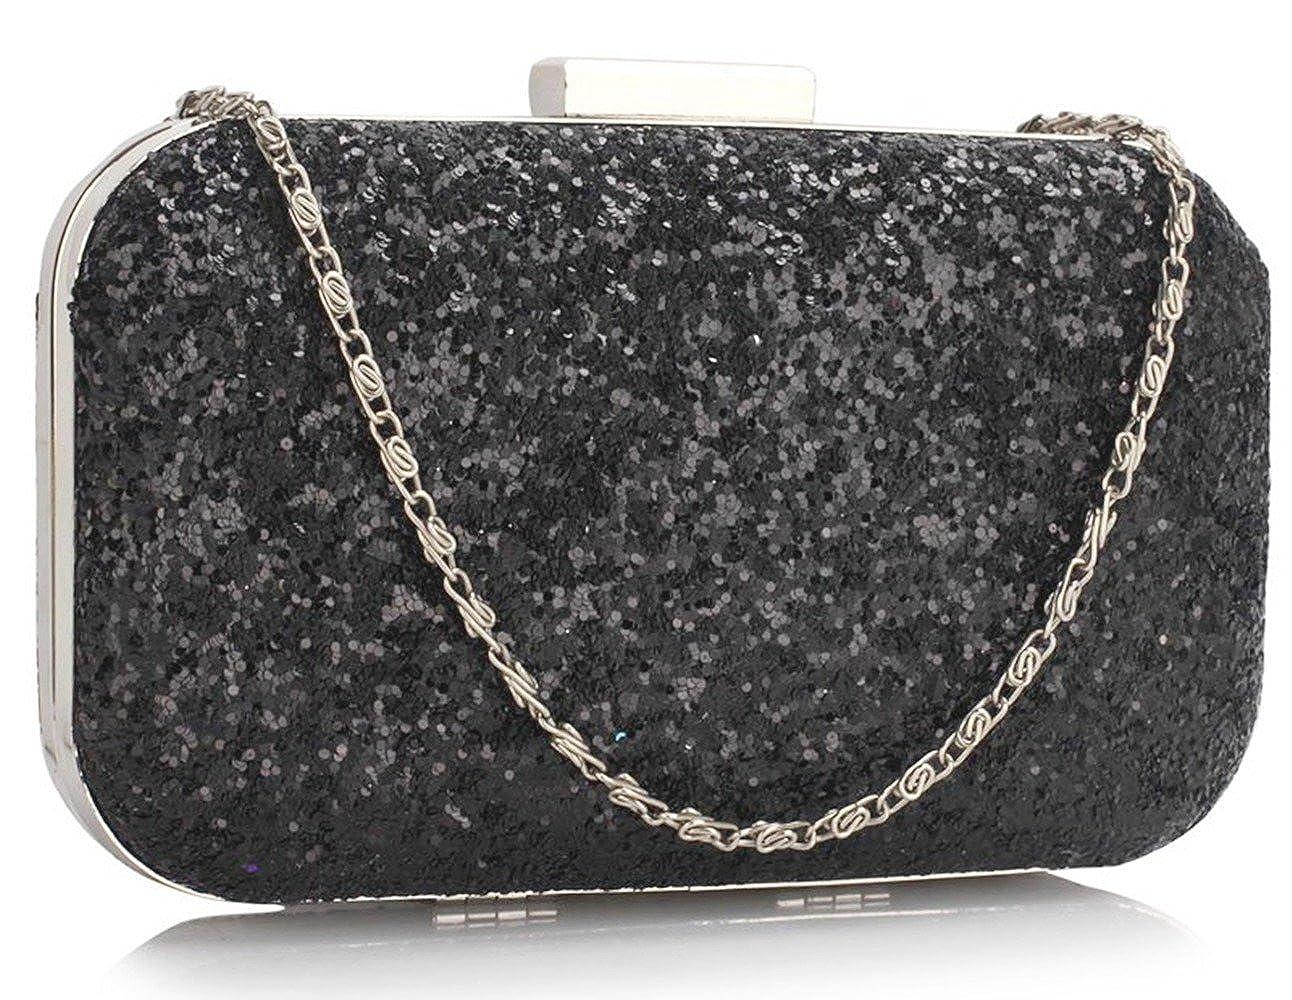 7c427cbdb75 LeahWard Women's Clutch Hard Case Handbag Purse For Wedding Night Out  Bridal Purse